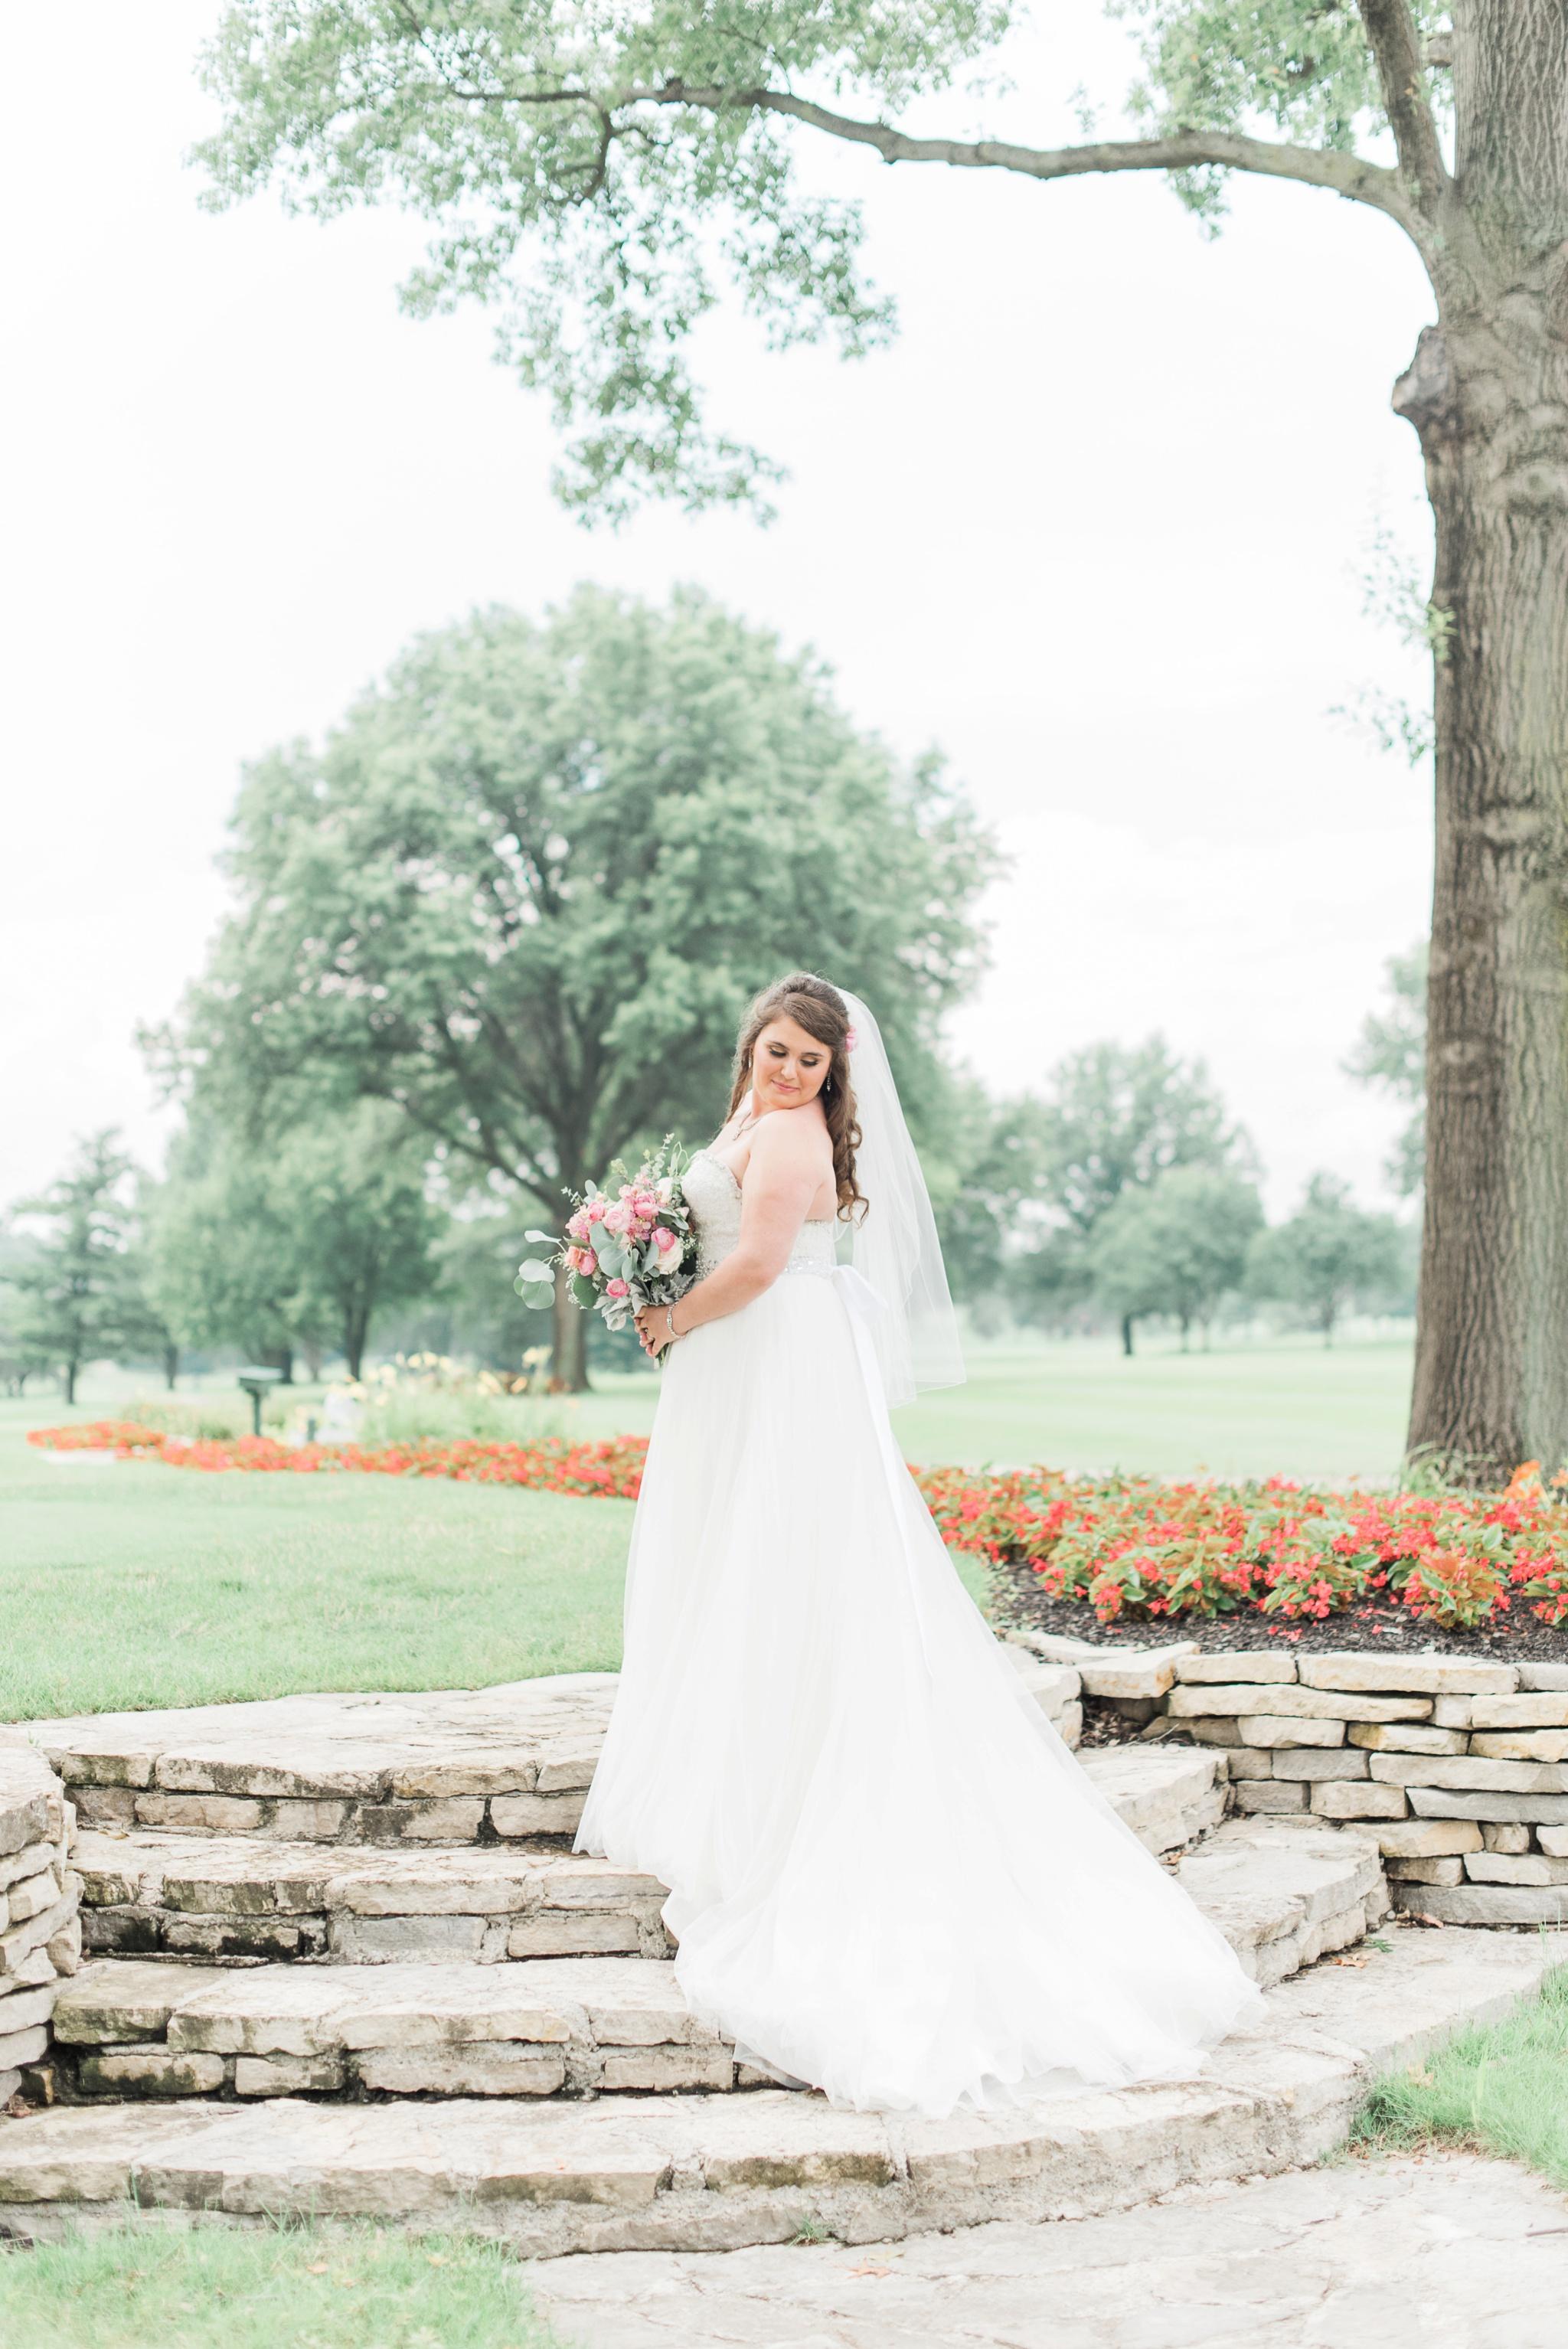 worthington-hills-country-club-wedding-columbus-ohio-meg-evan_0133.jpg